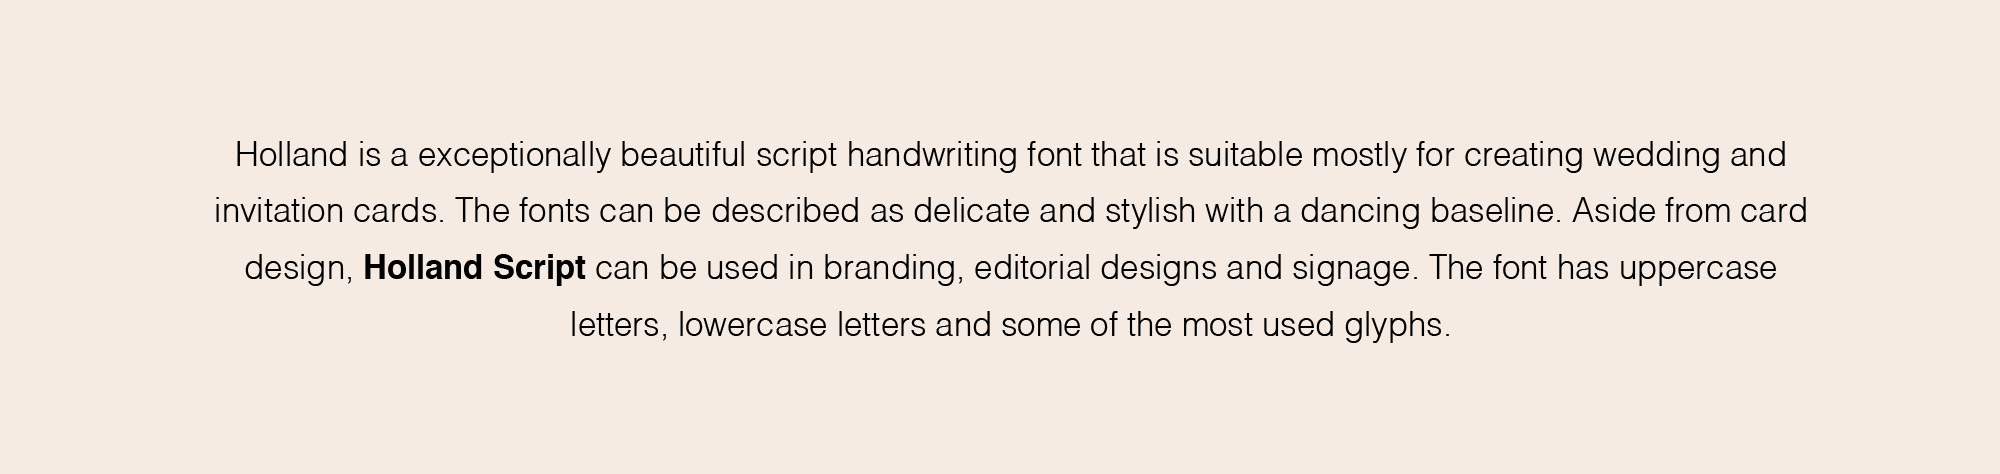 Holland Script Handwriting Font